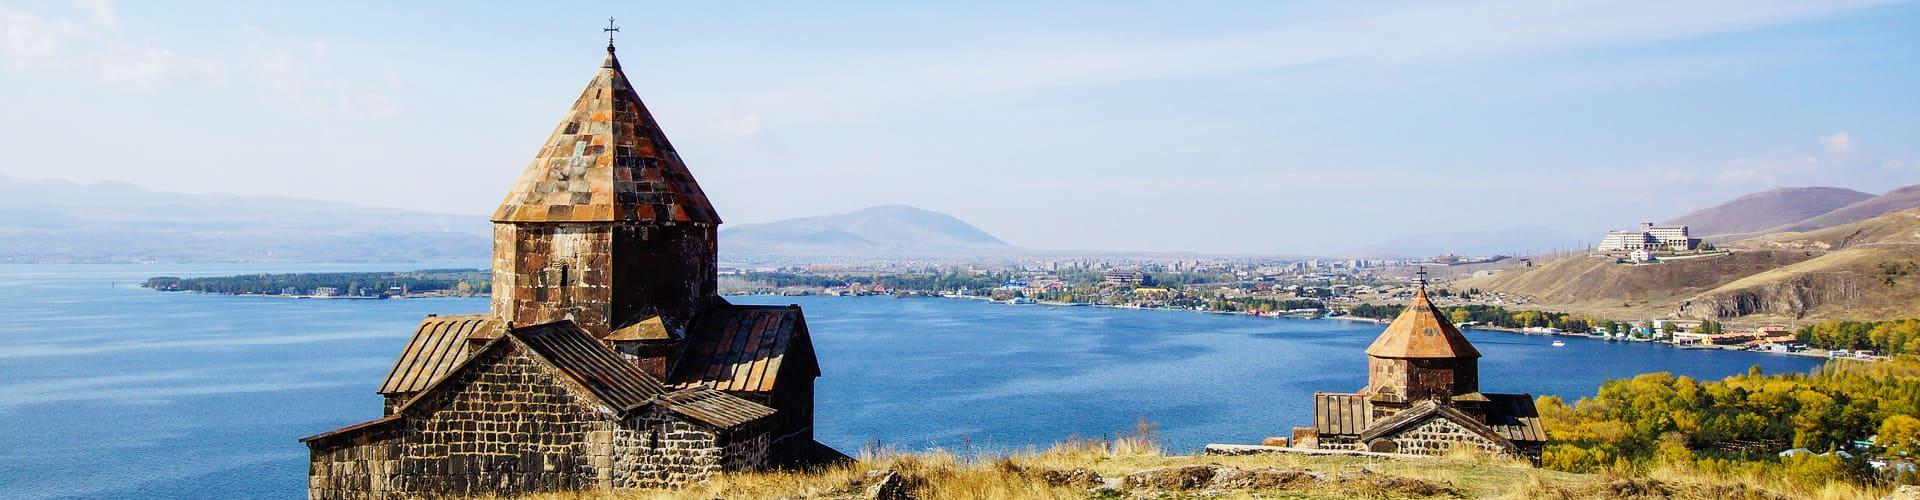 armenia Tour Package Deals